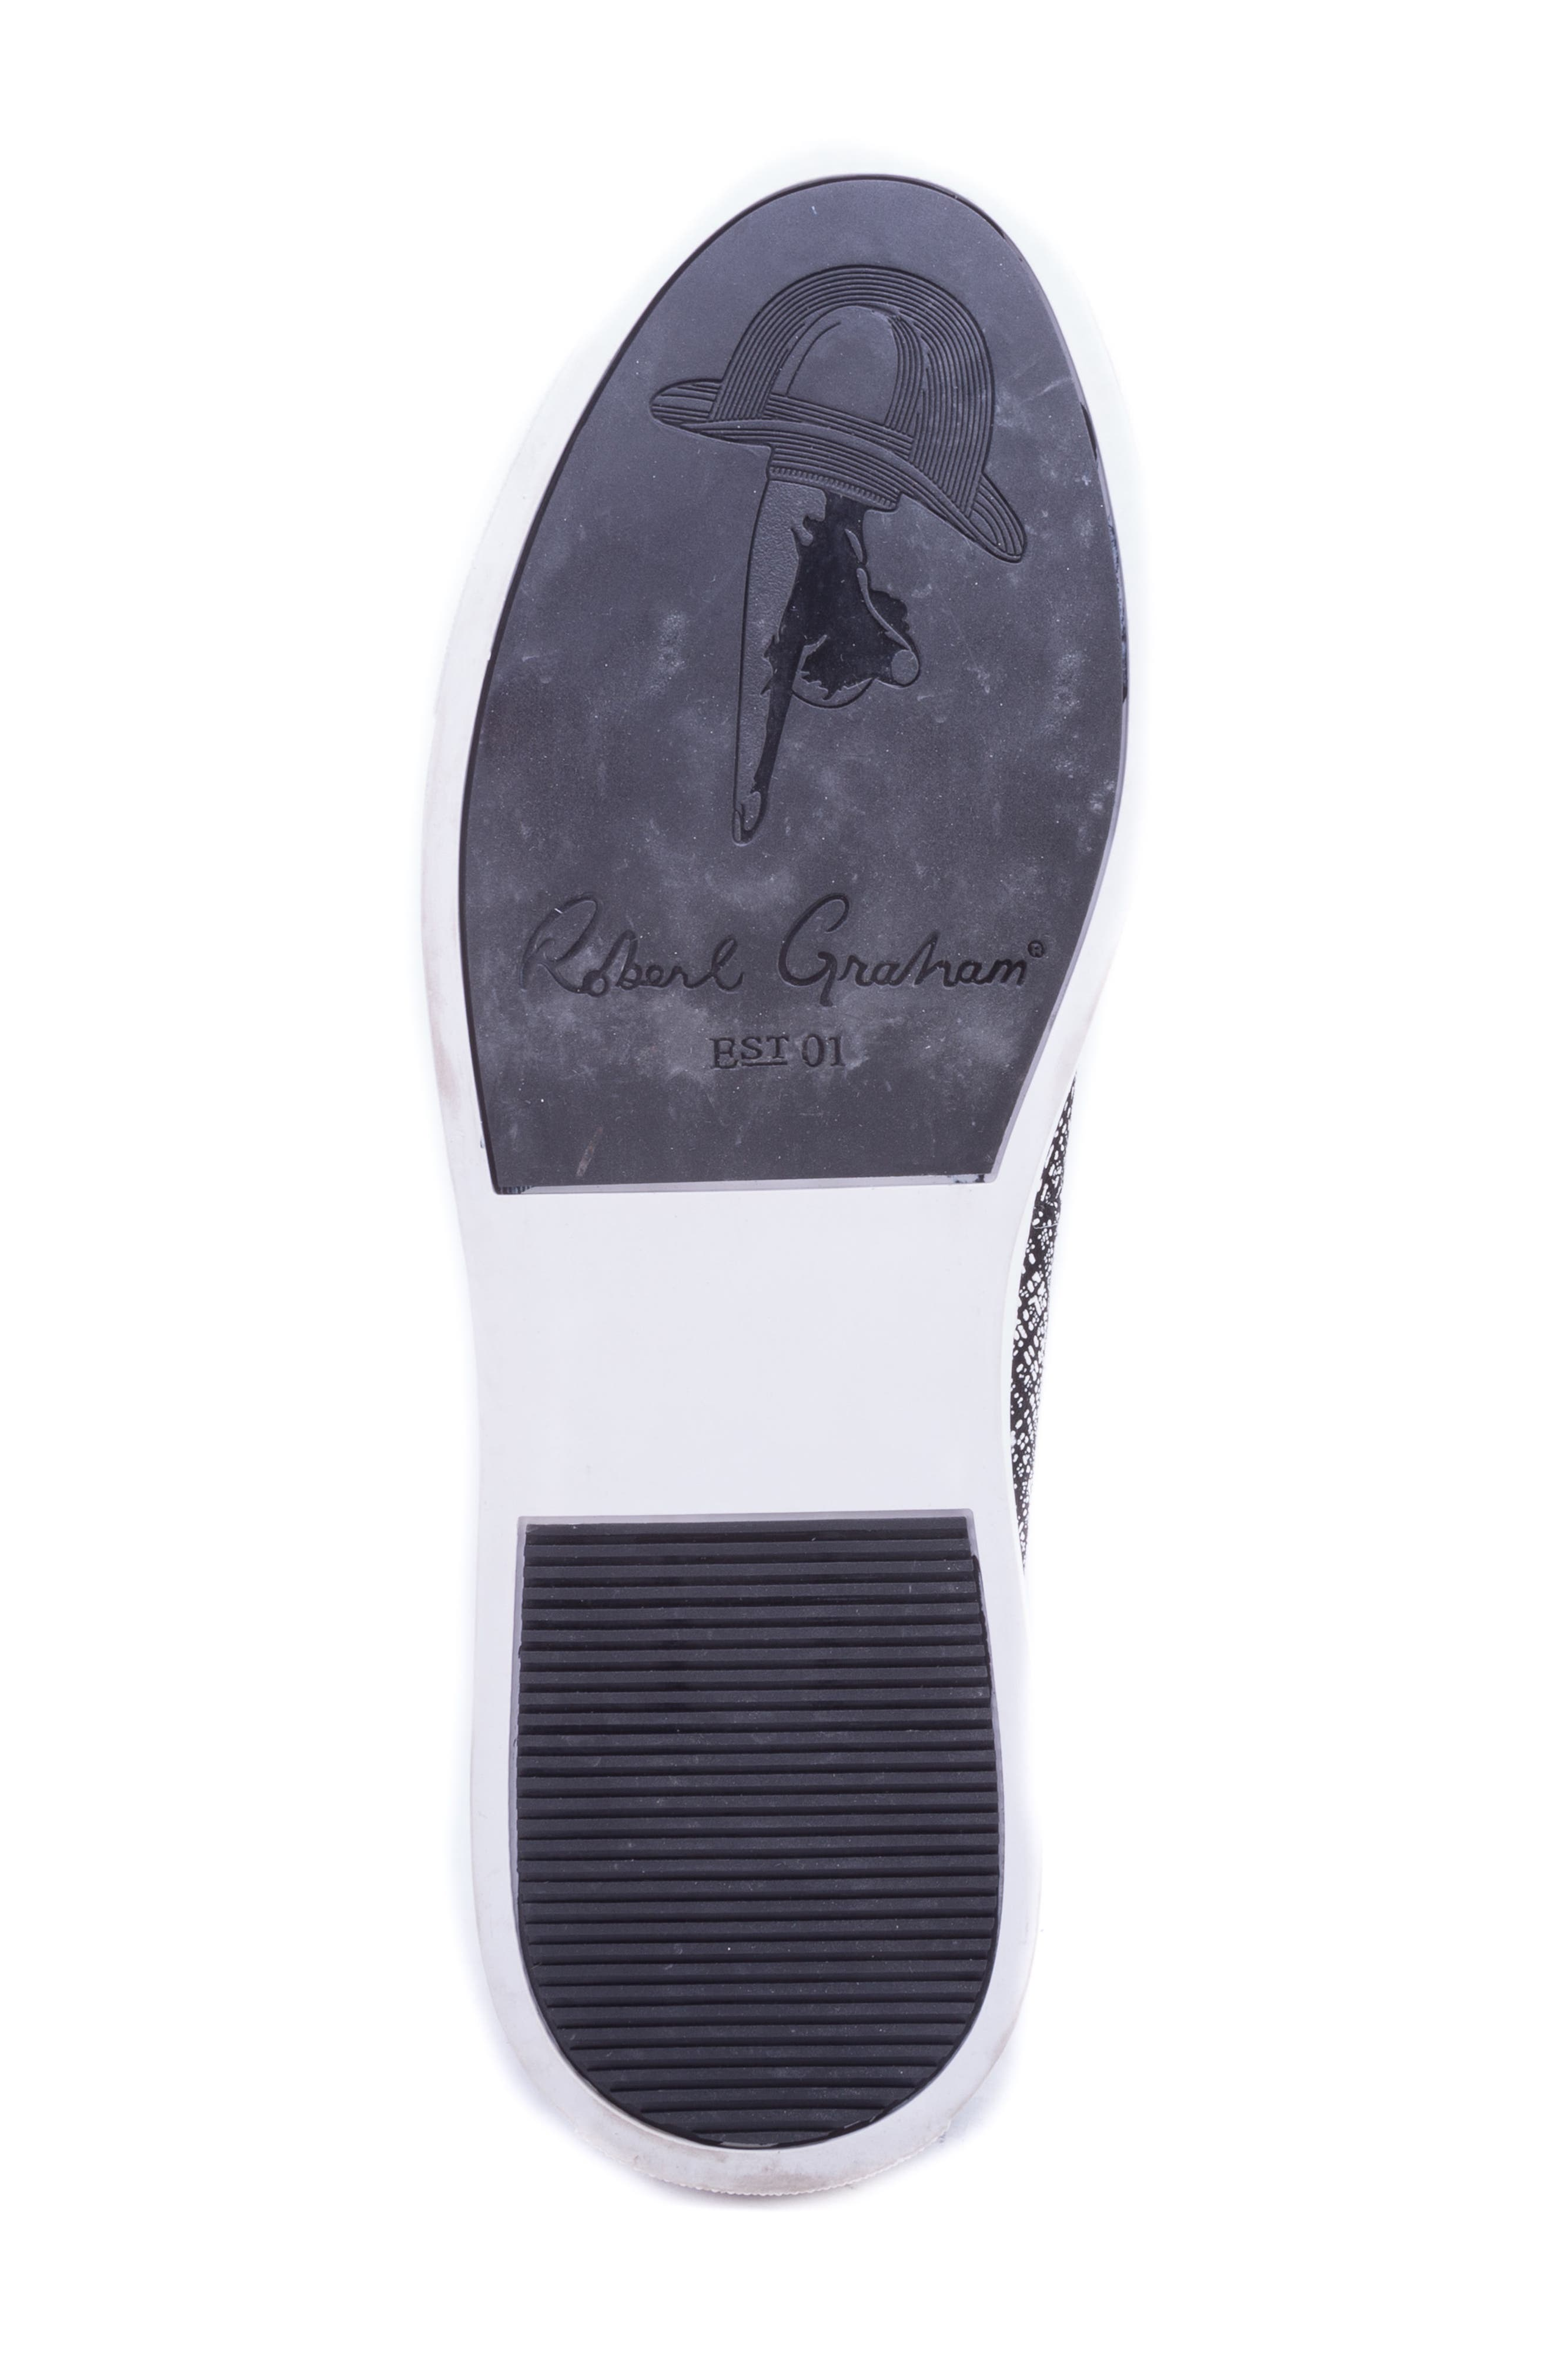 Kitson Slip-On Sneaker,                             Alternate thumbnail 6, color,                             BLACK SUEDE